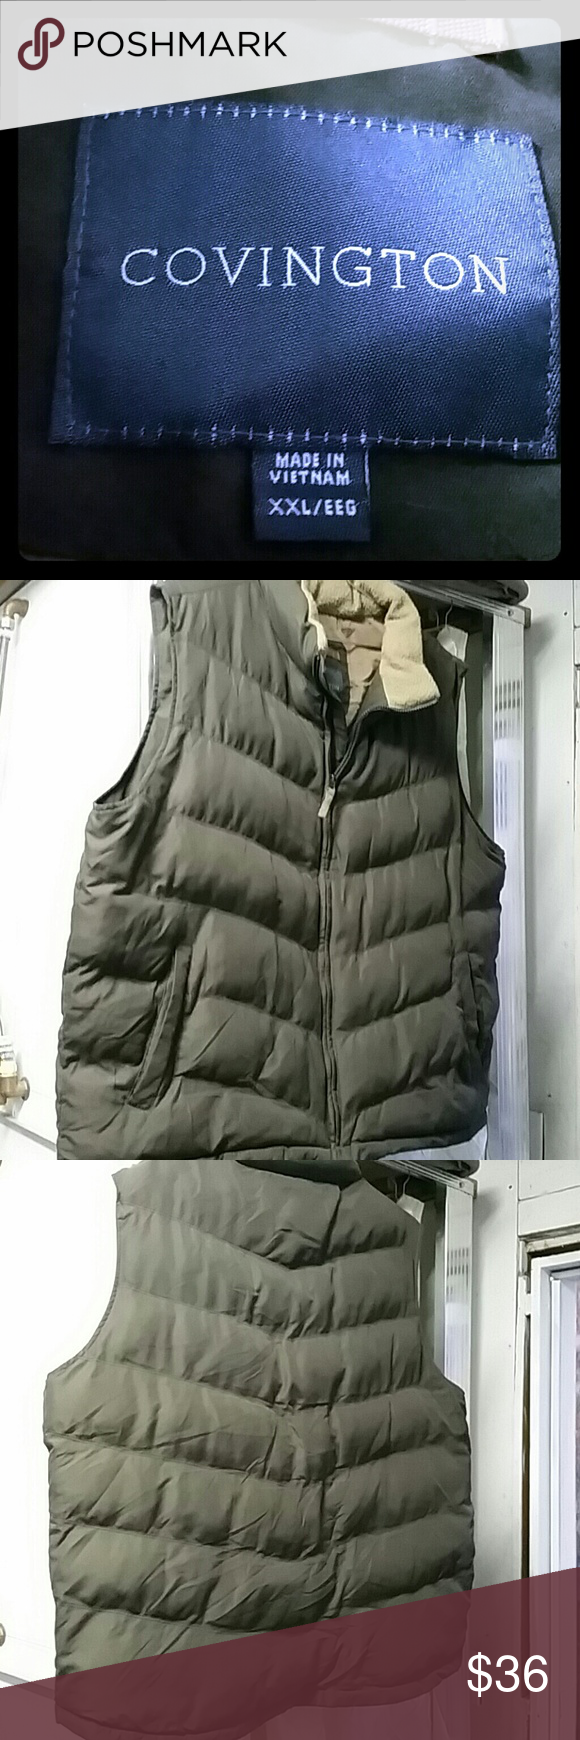 Used Men S Soft Vet Used Good Condition Covington Jackets Coats Vests Today S Man Soft Vets [ 1740 x 580 Pixel ]